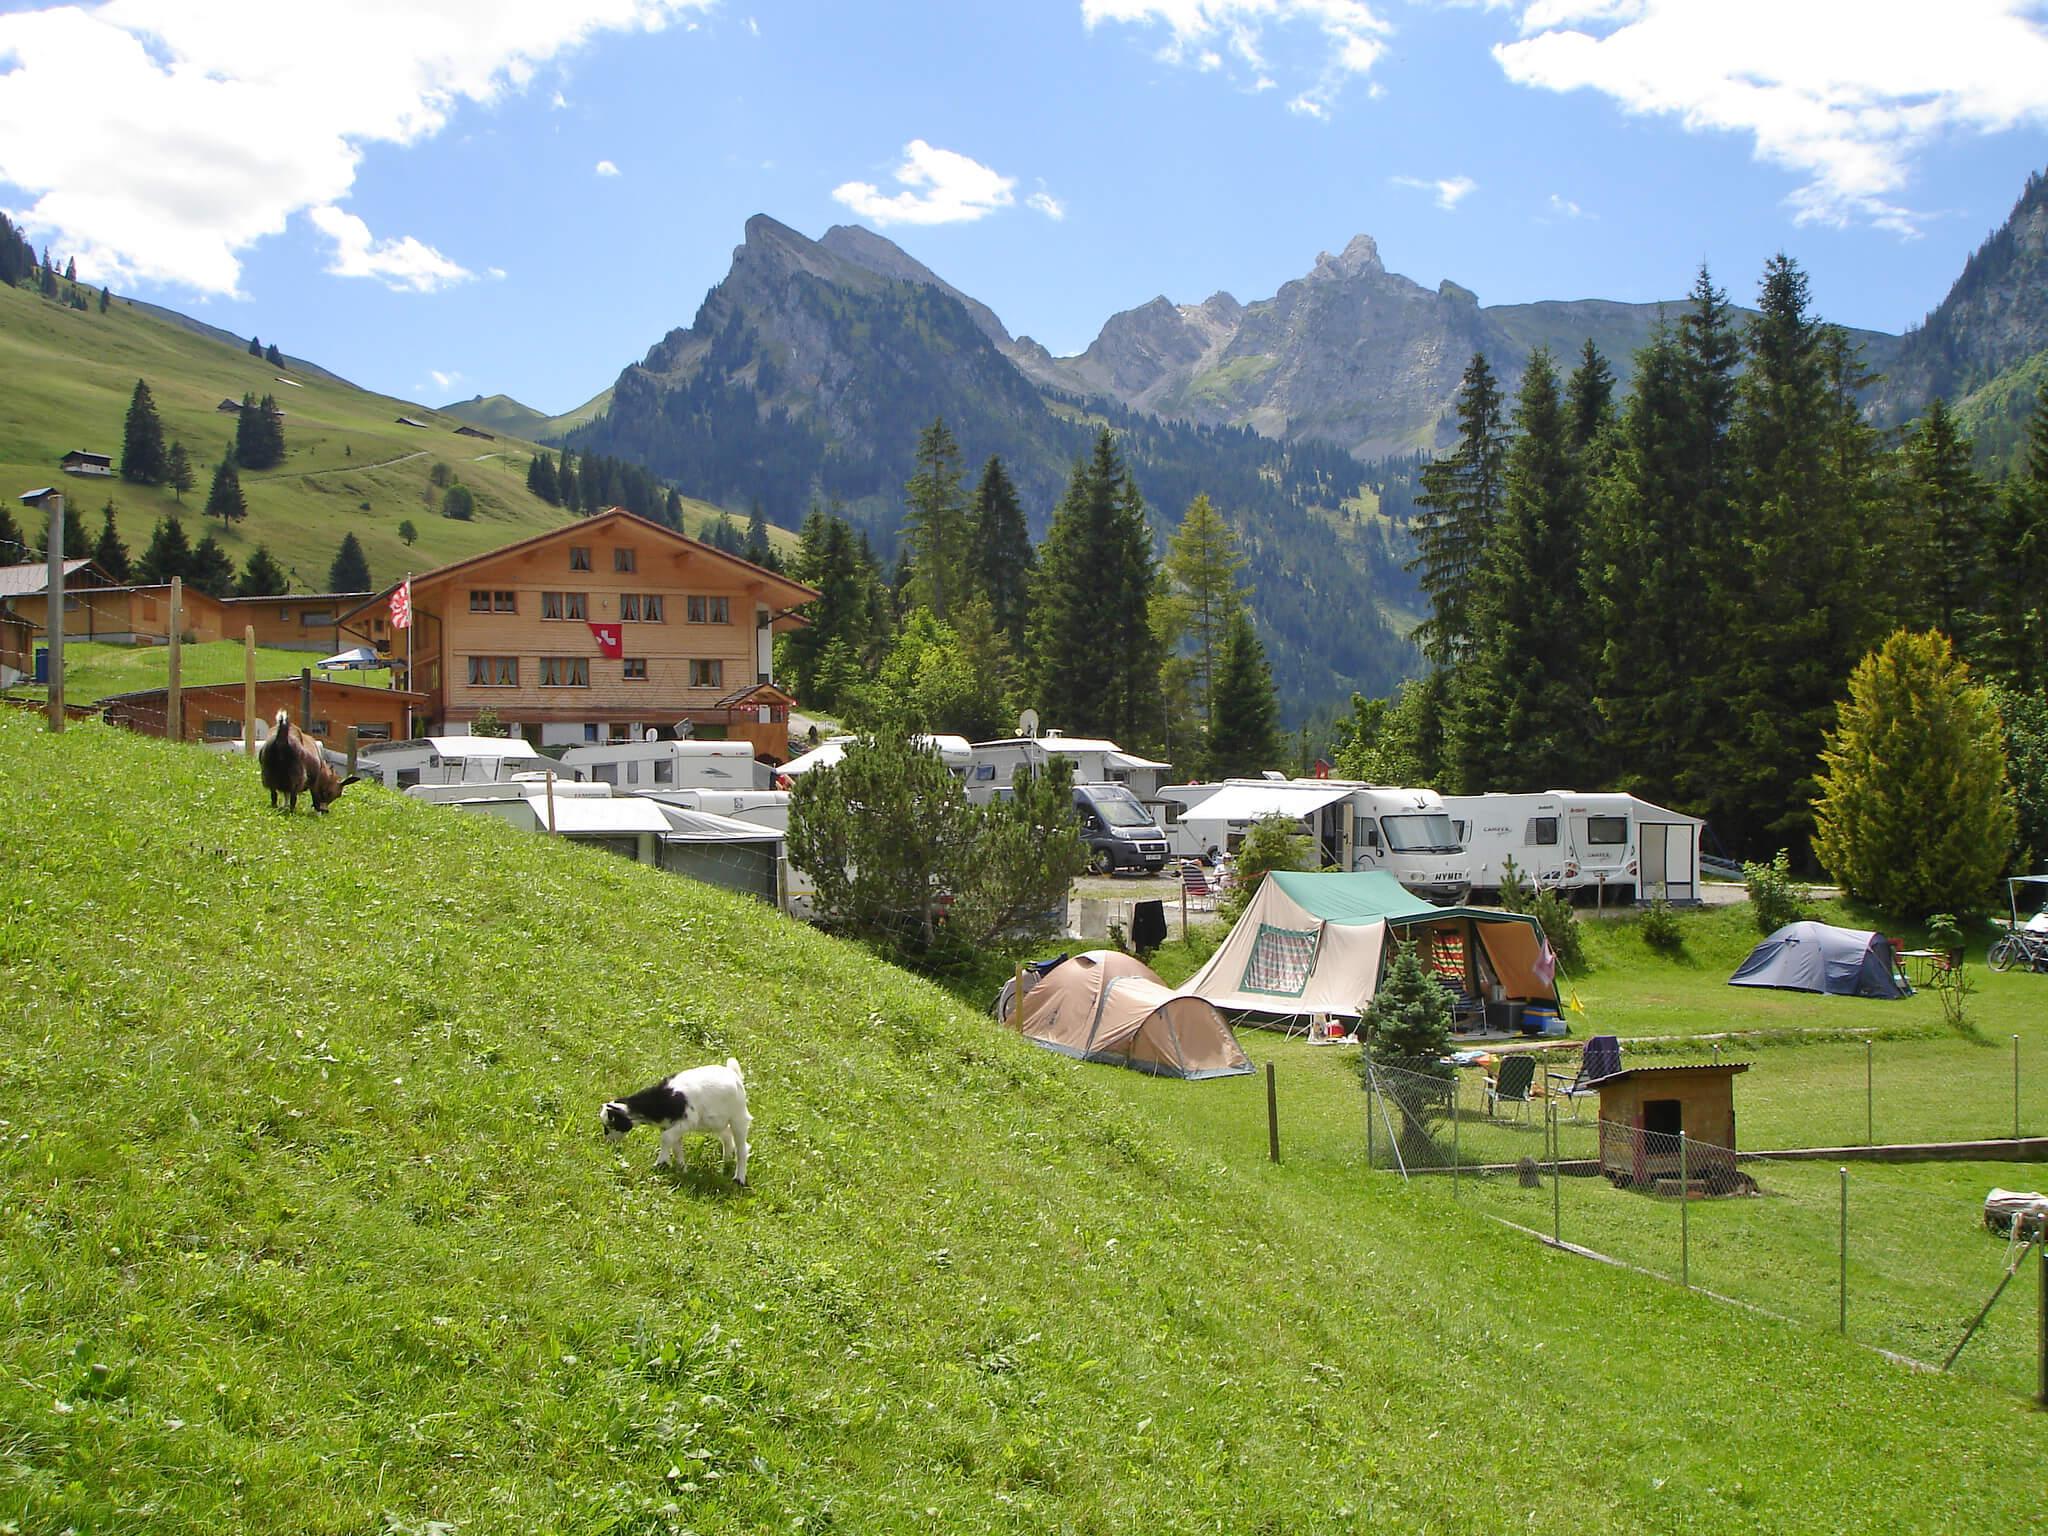 Camping Sommer Ziegen Wohnmobil Zelt Camper